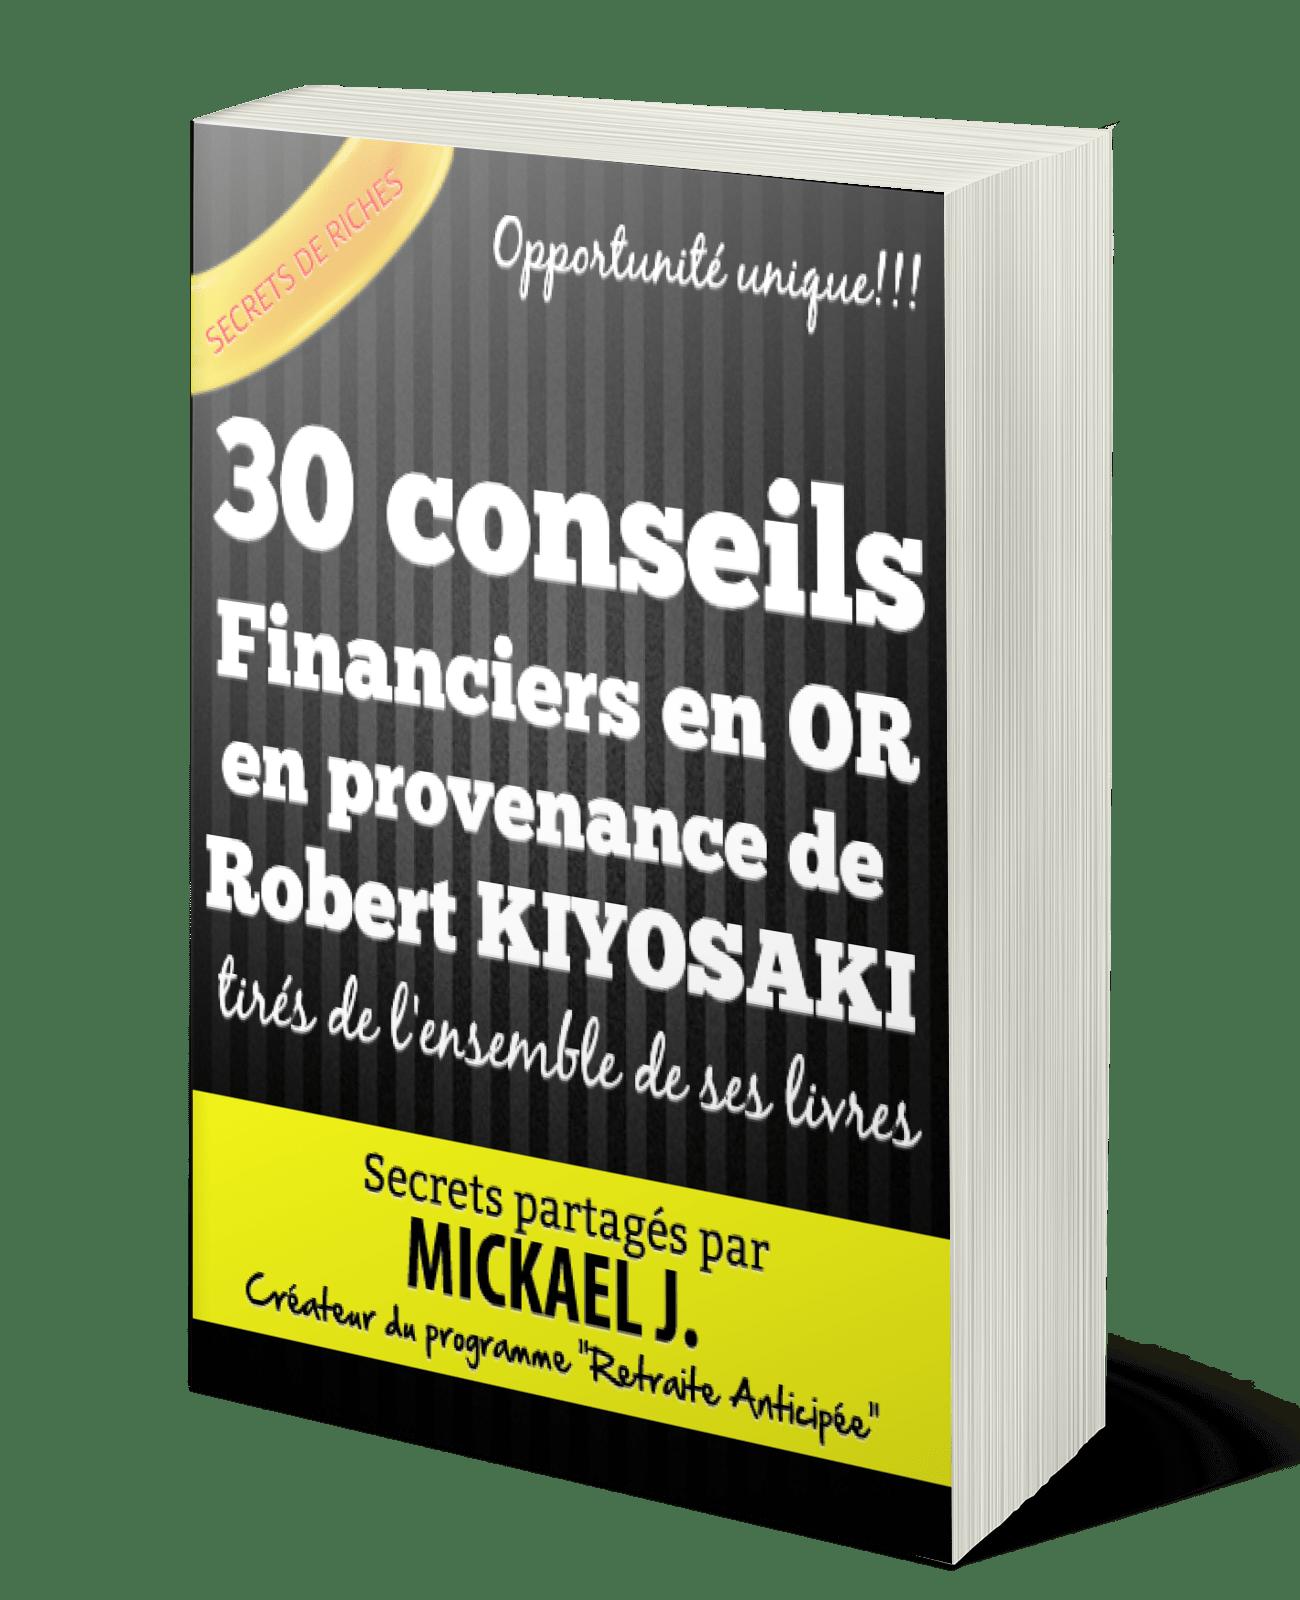 indépendance financière avec Robert Kiyosaki